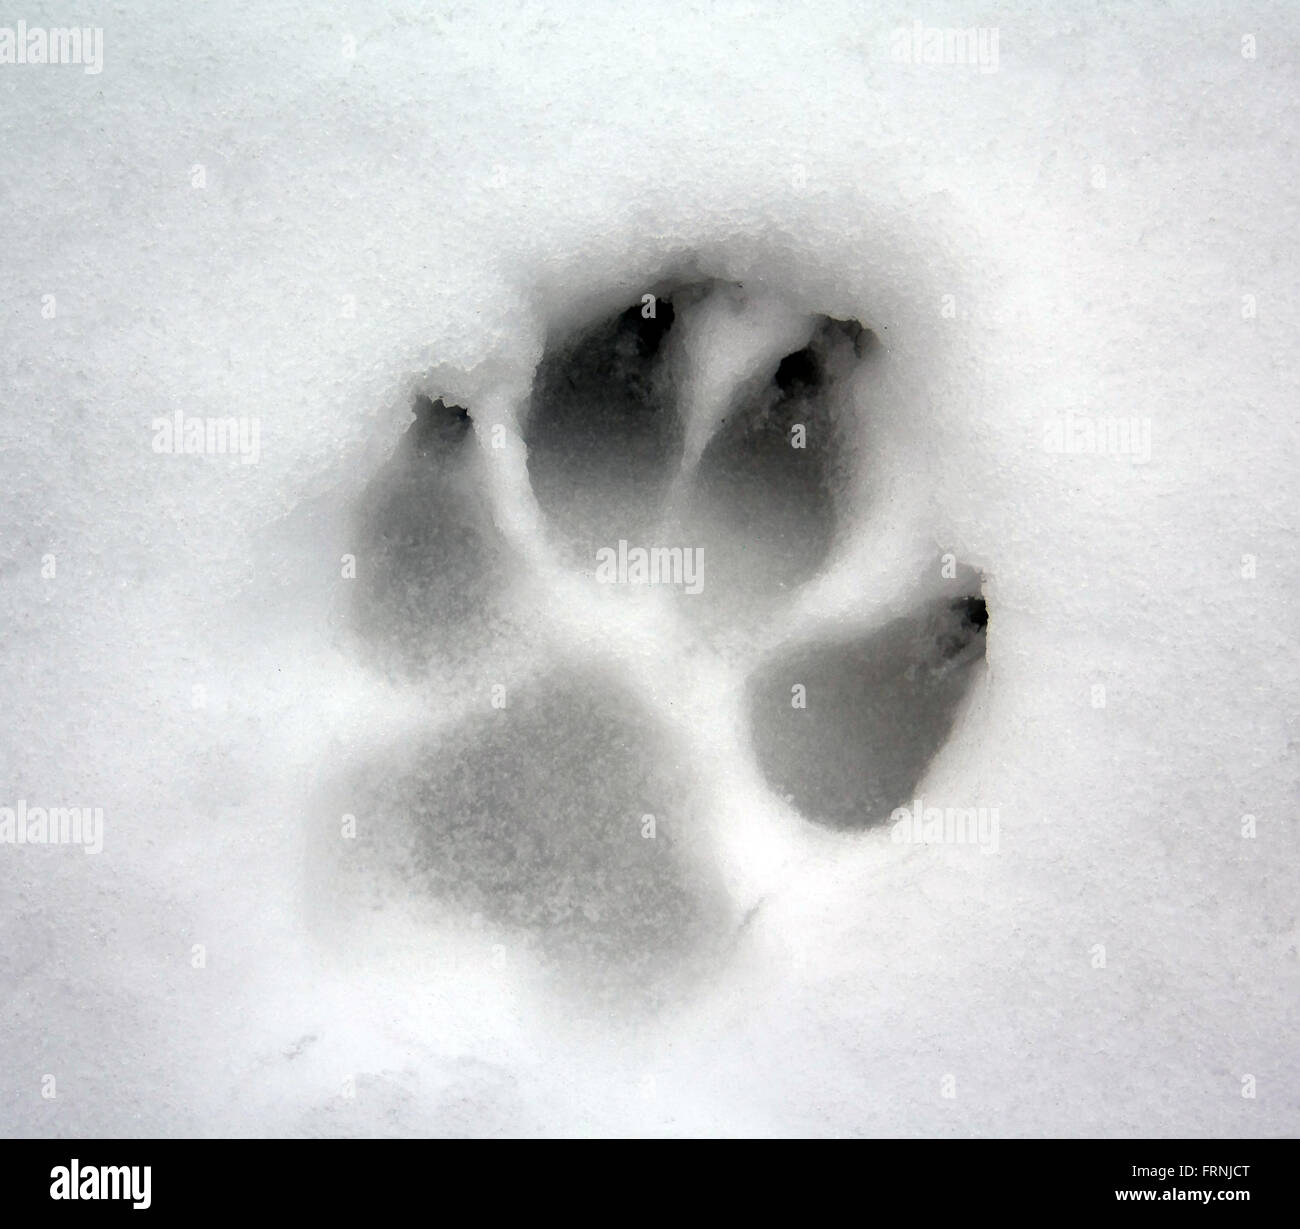 dog paw print on snow Stock Photo: 100664392 - Alamy